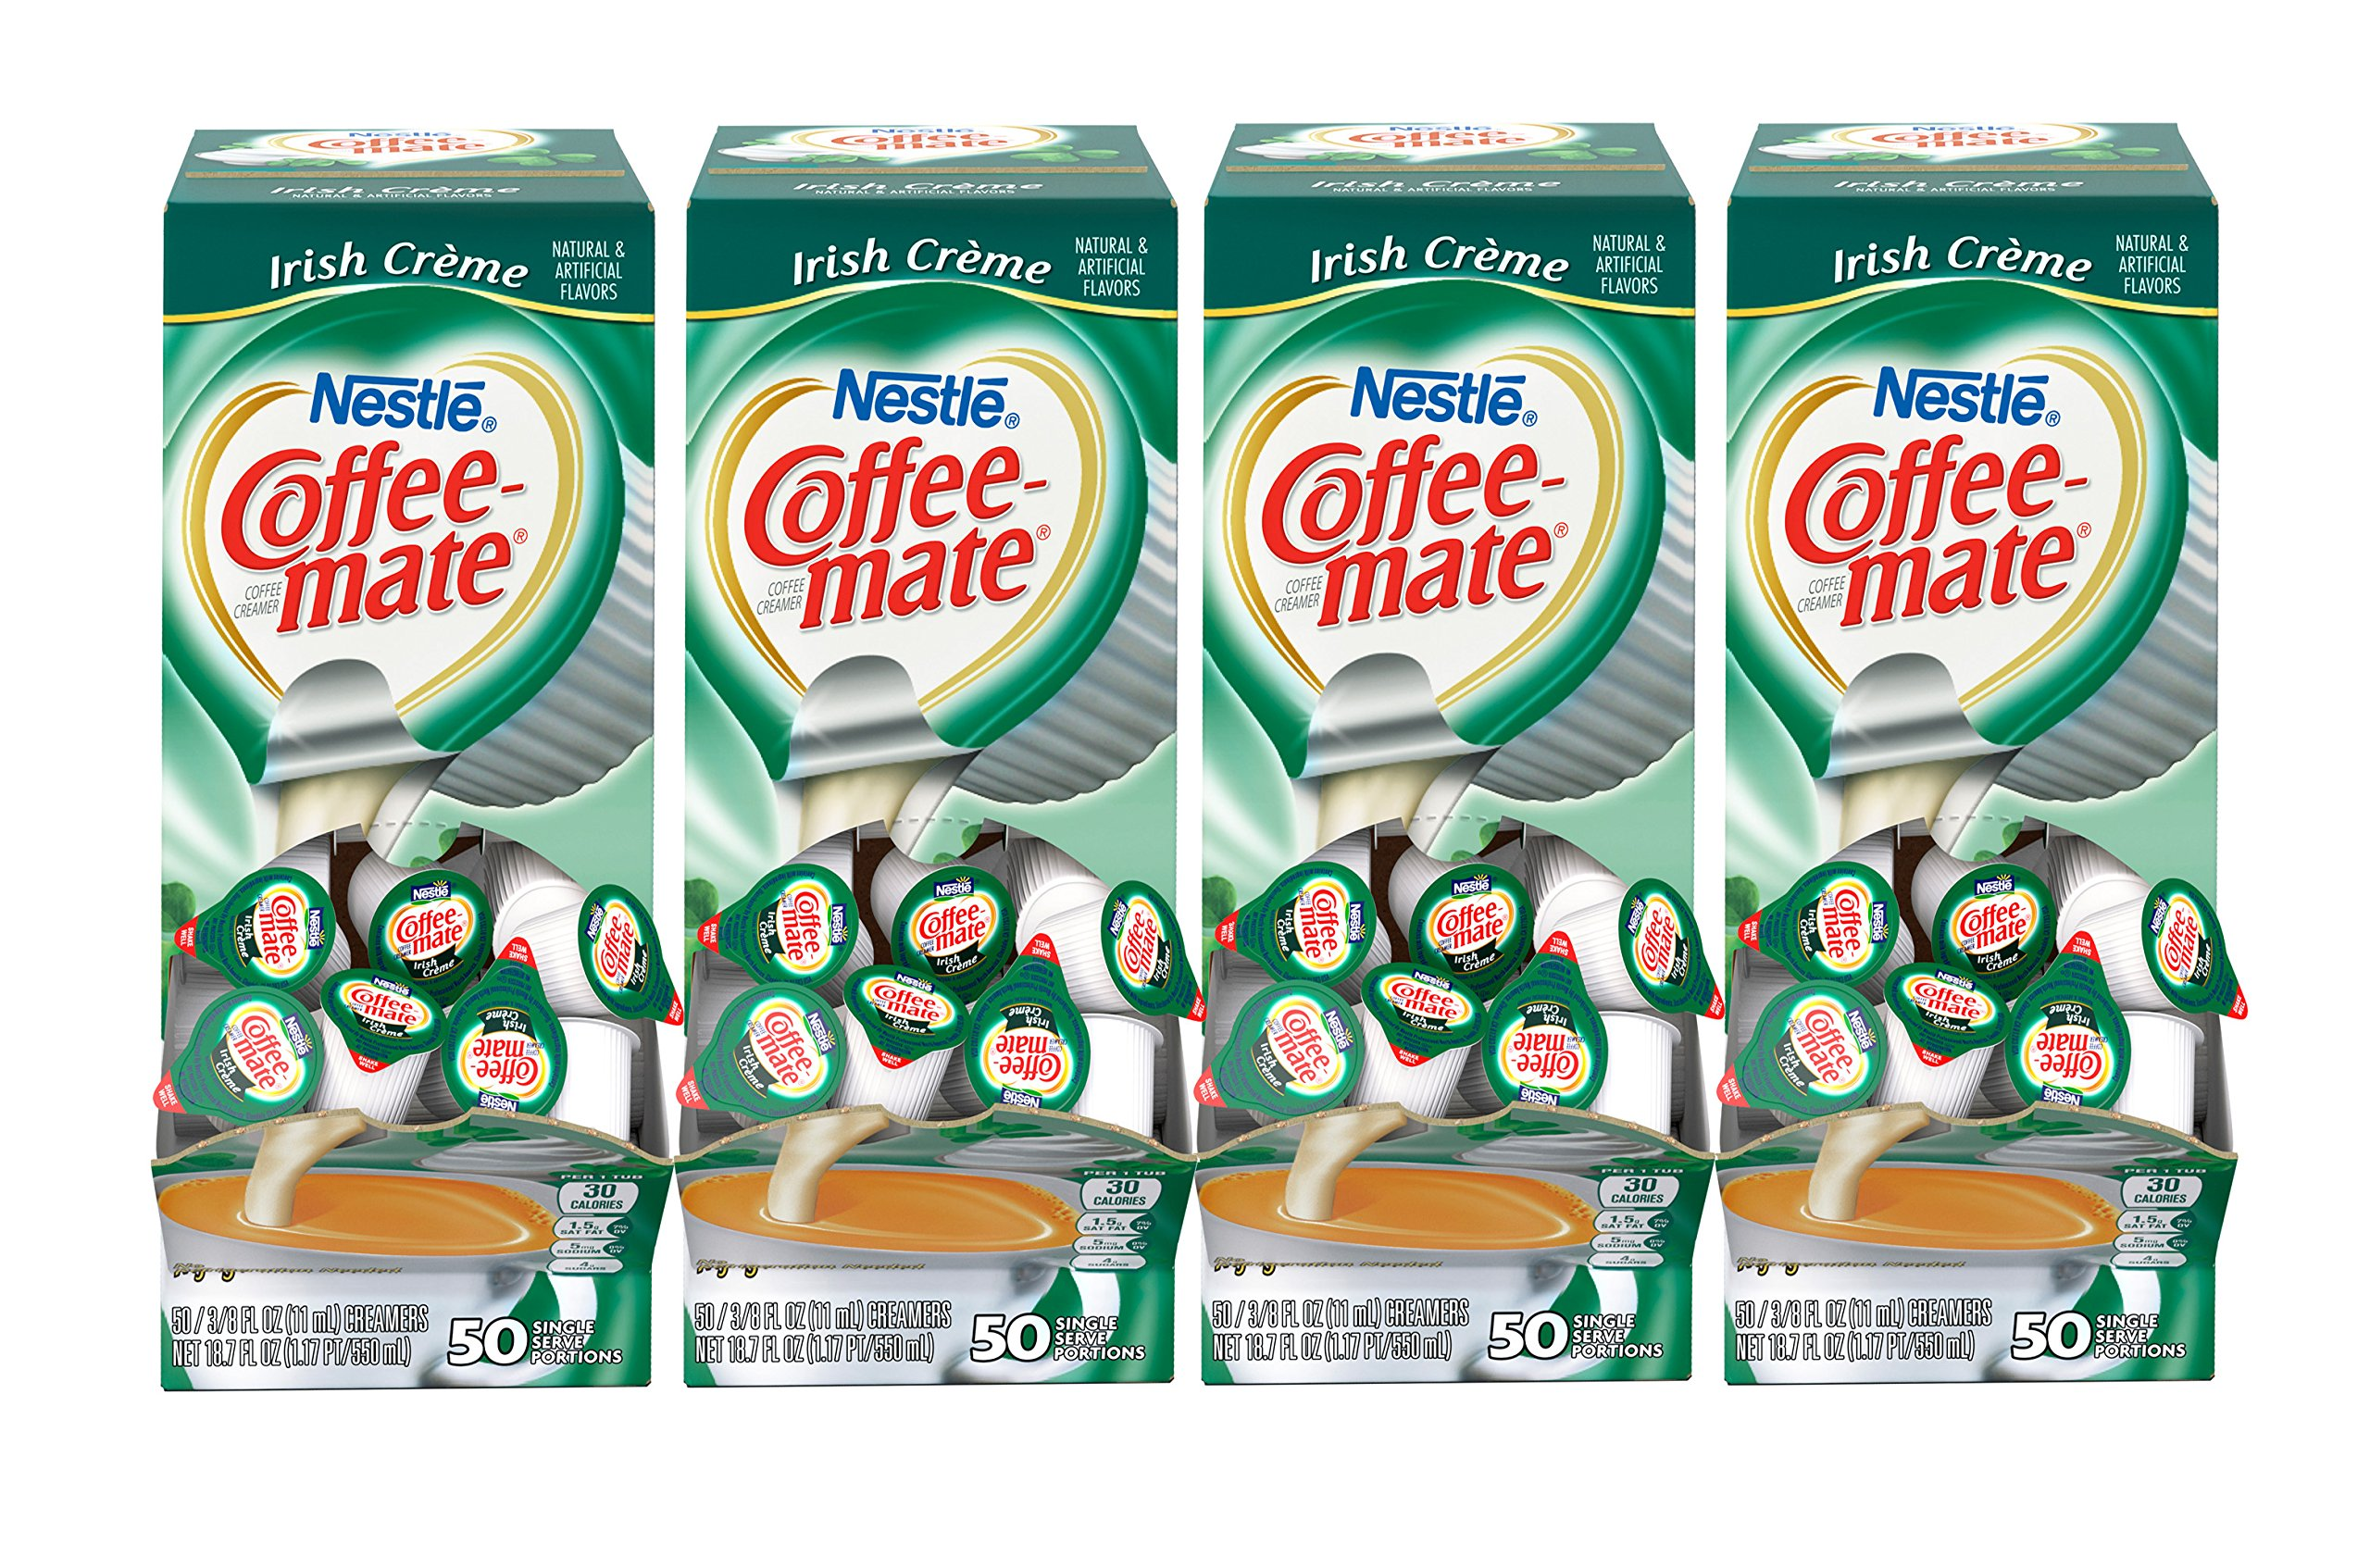 NESTLE COFFEE-MATE Coffee Creamer, Irish Creme, liquid creamer singles, 50 Count (Pack of 4) by Nestle Coffee Mate (Image #1)